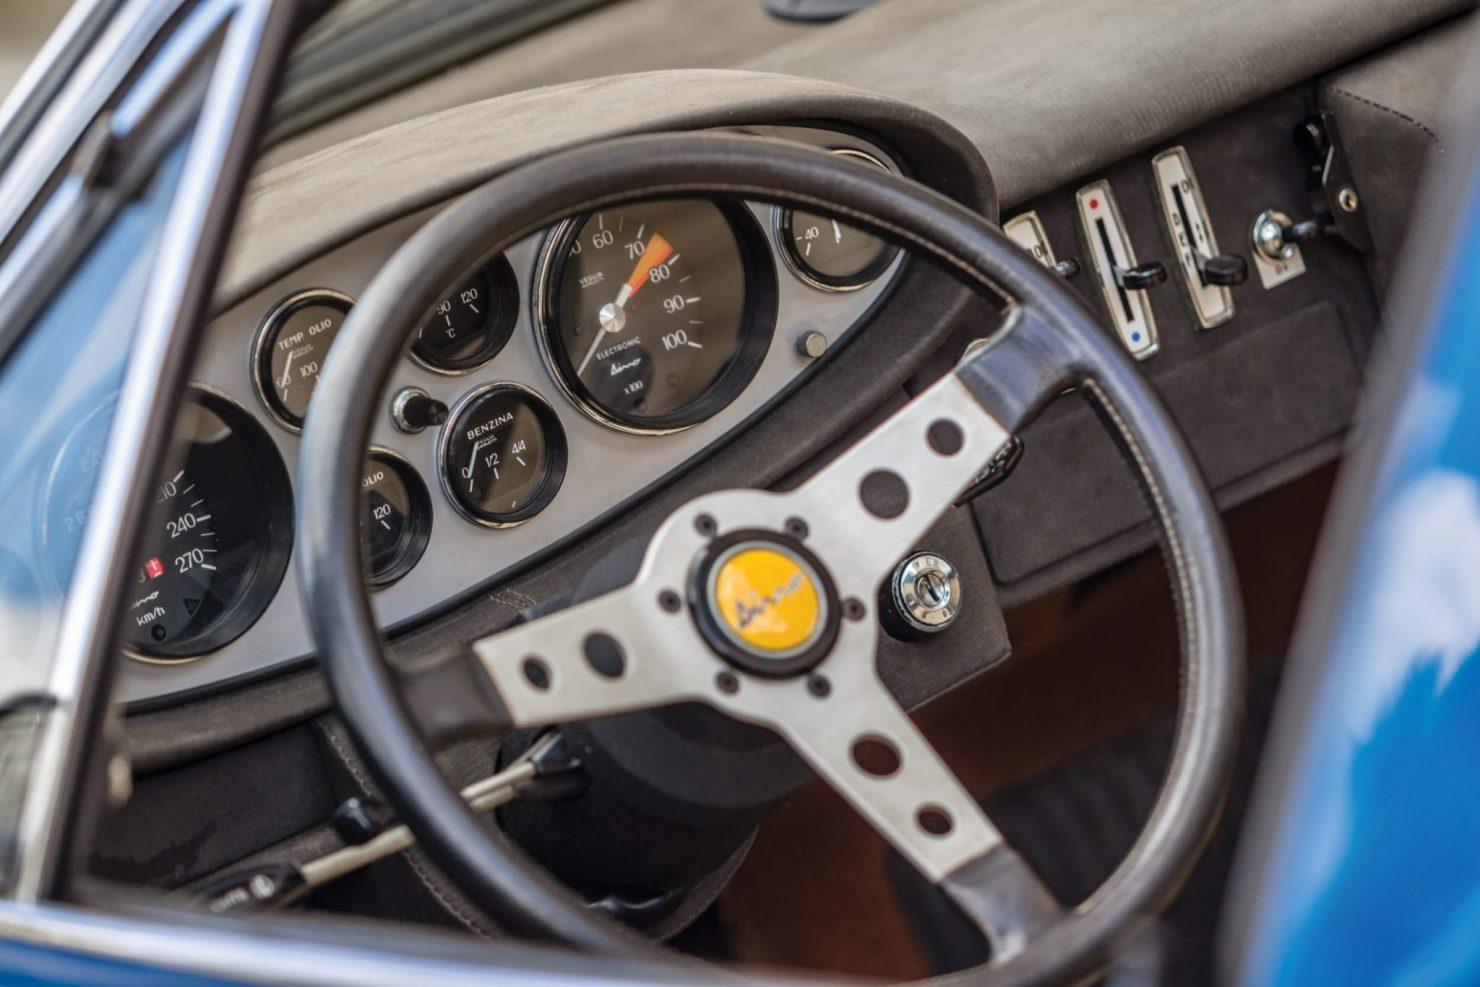 ferrari dino 246 gts car 10 1480x987 - 1973 Ferrari Dino 246 GTS